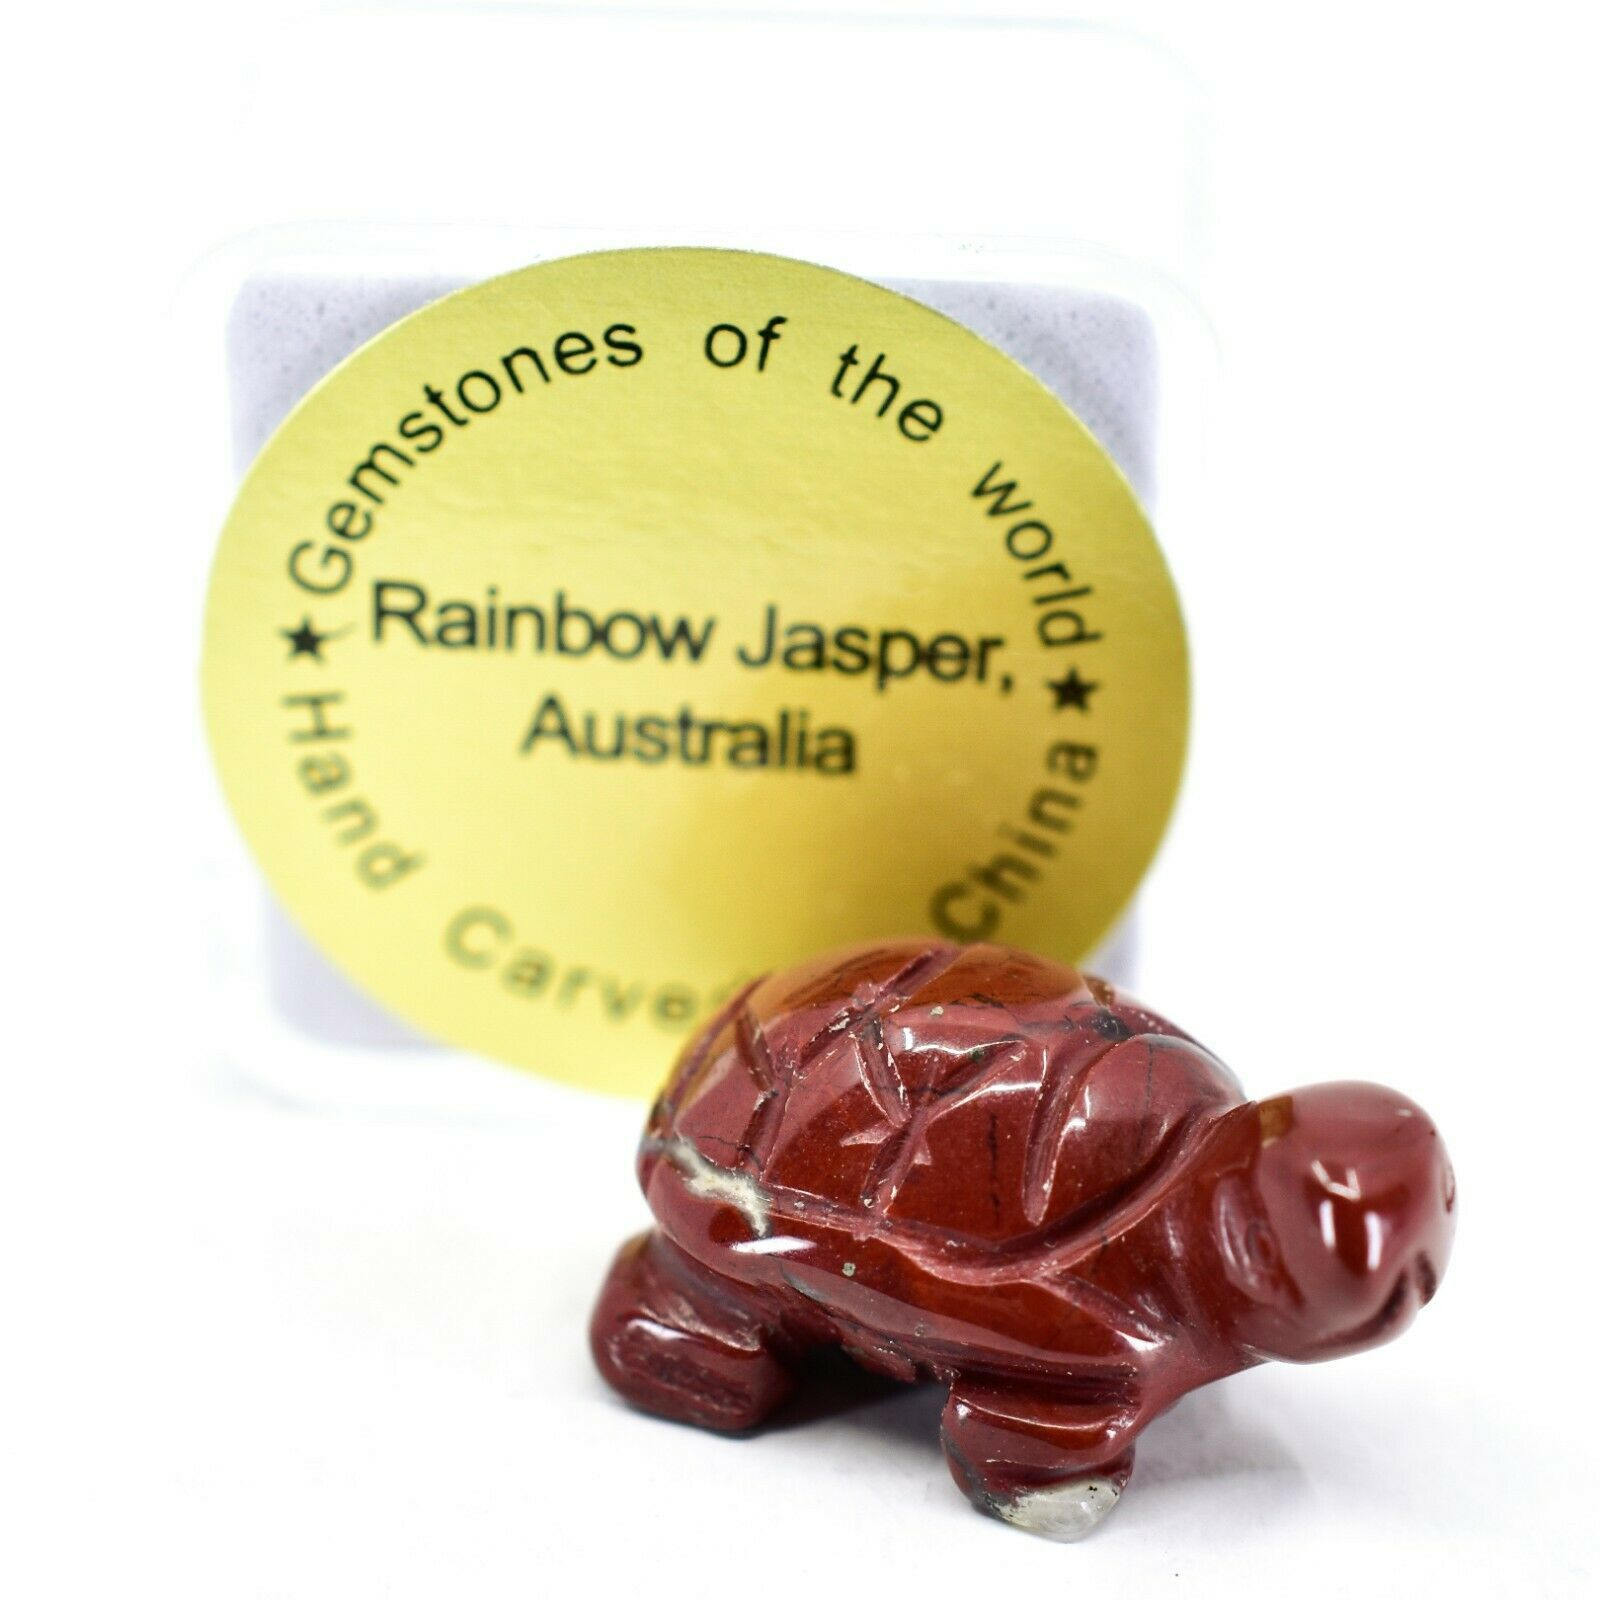 Rainbow Jasper Gemstone Tiny Miniature Turtle Figurine Hand Carved in China